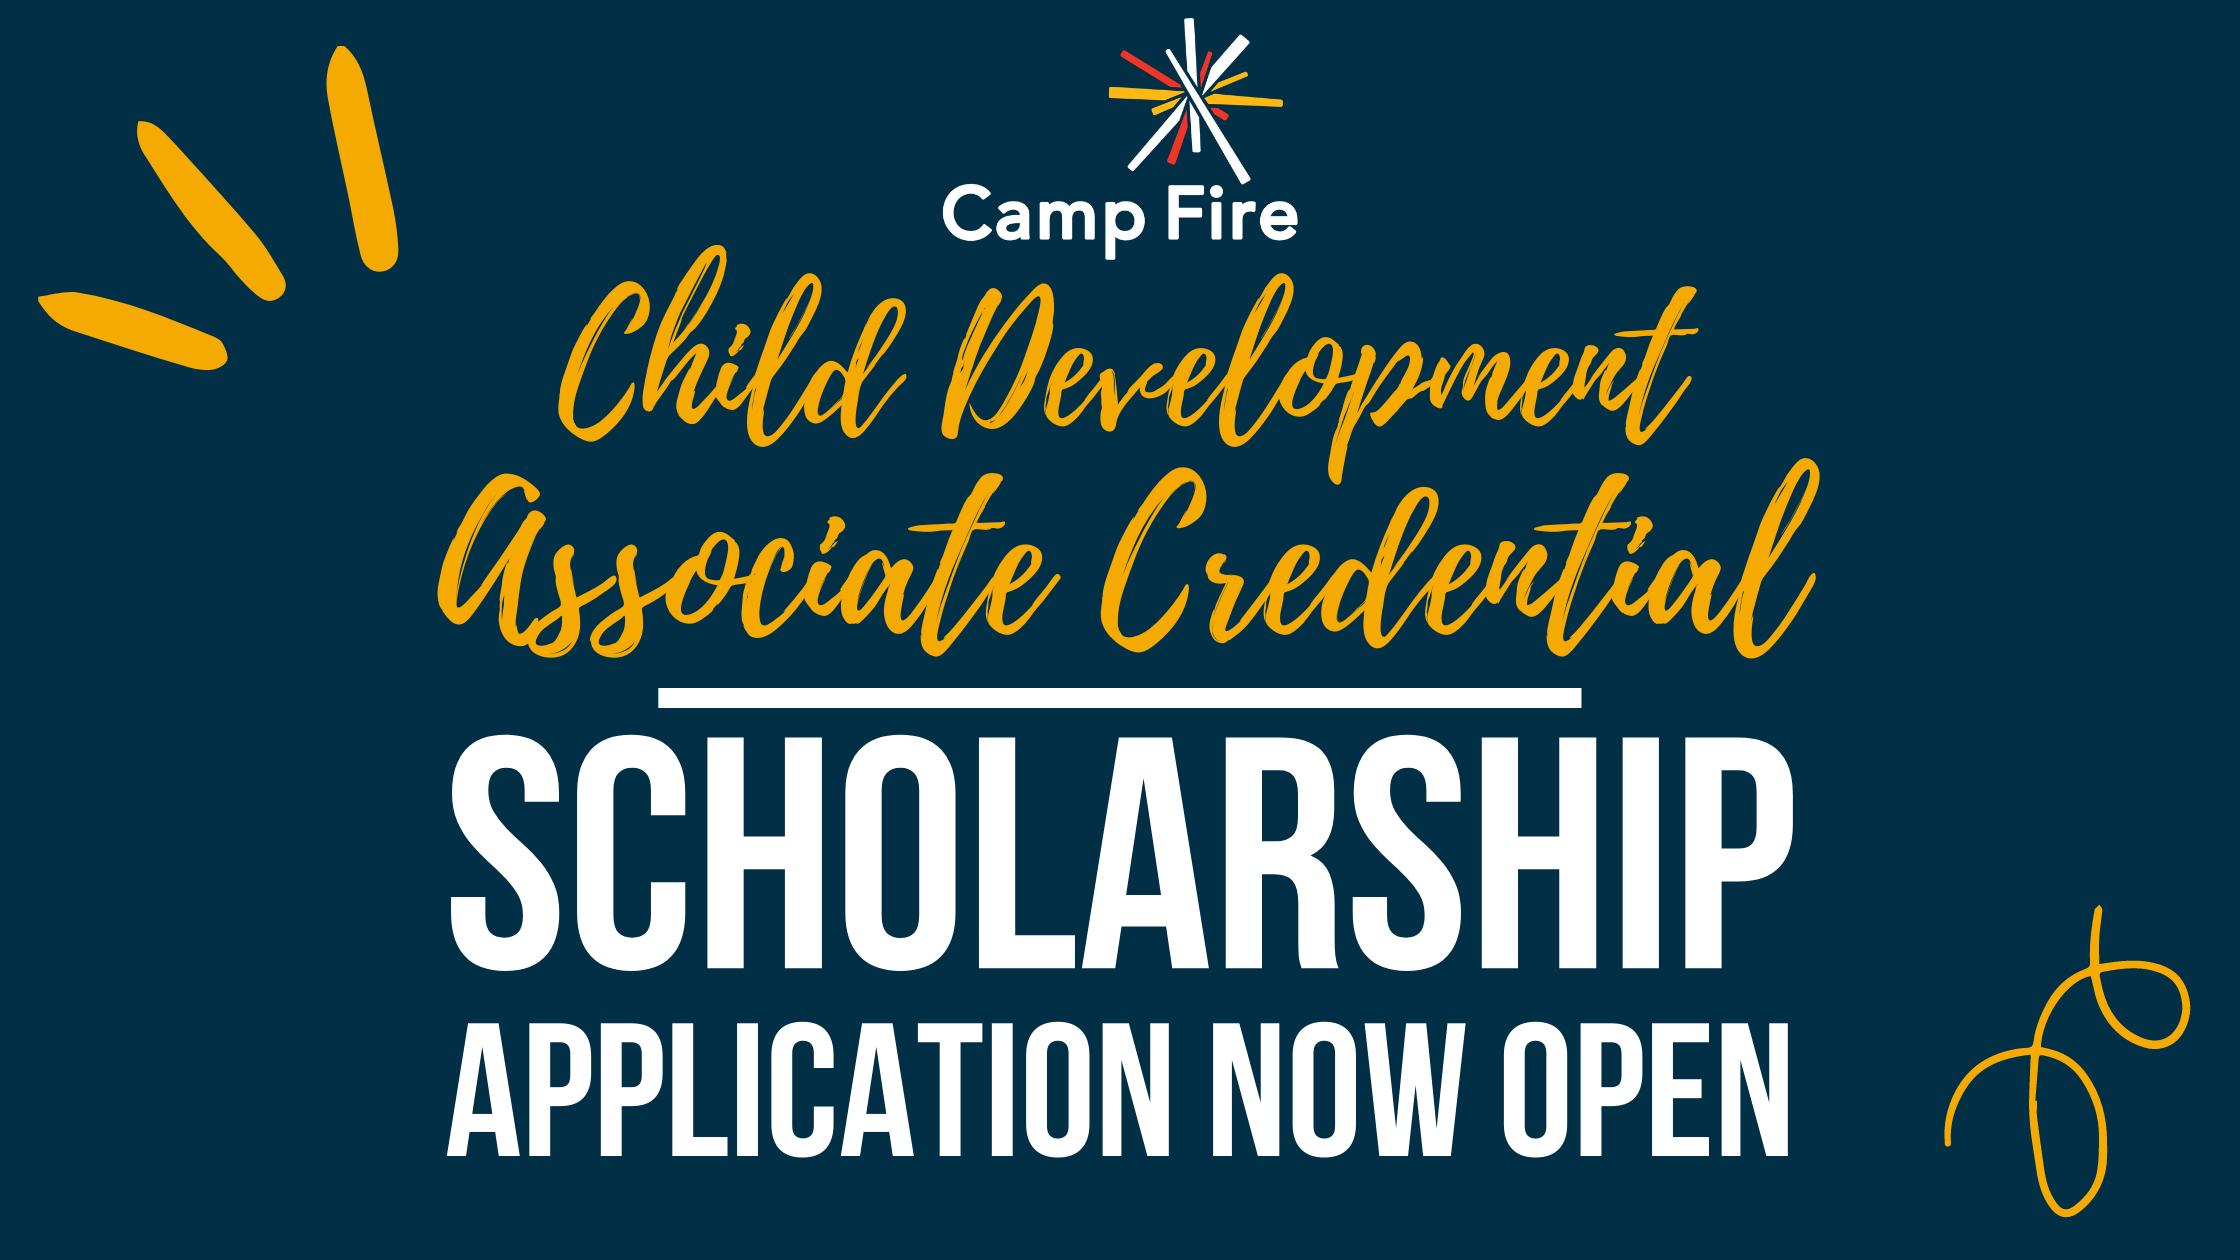 CDA Scholarship Application Now Open